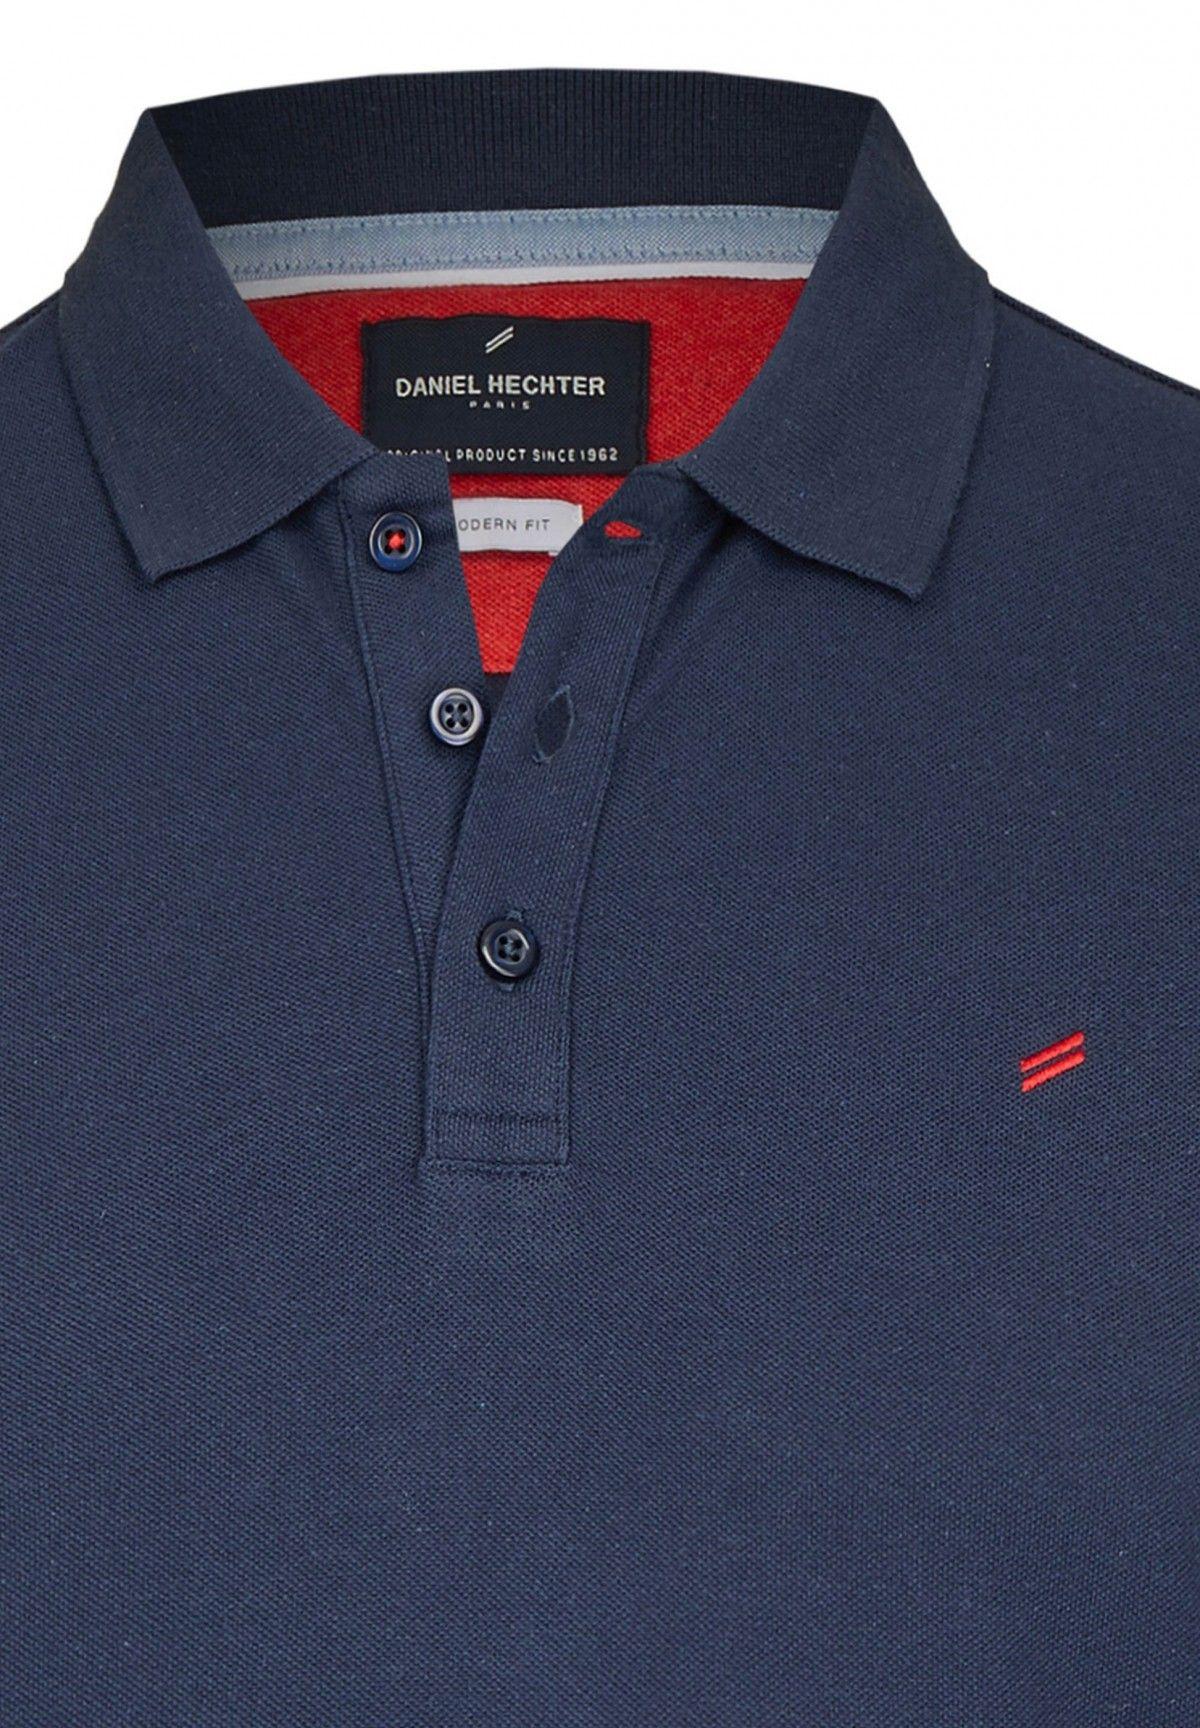 promo code 159da 58f19 Basic Polo in Modern Fit Passform, dark blue | Daniel ...